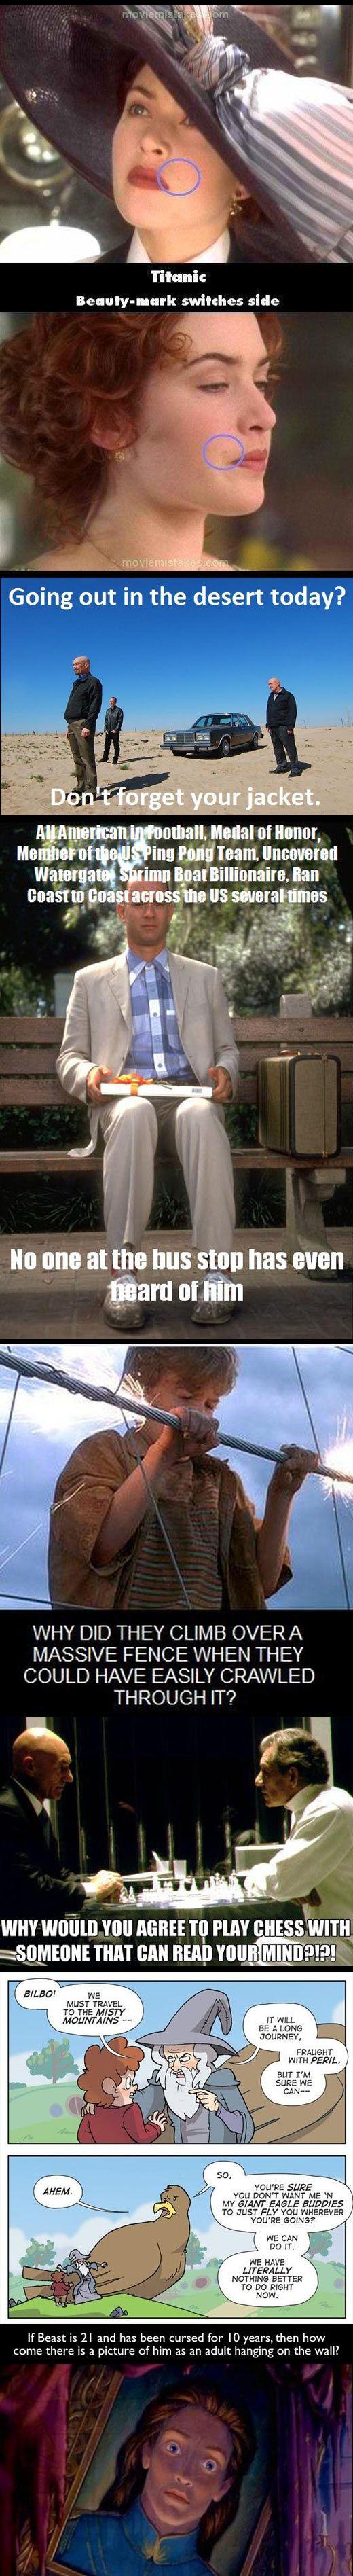 Movie mishaps.